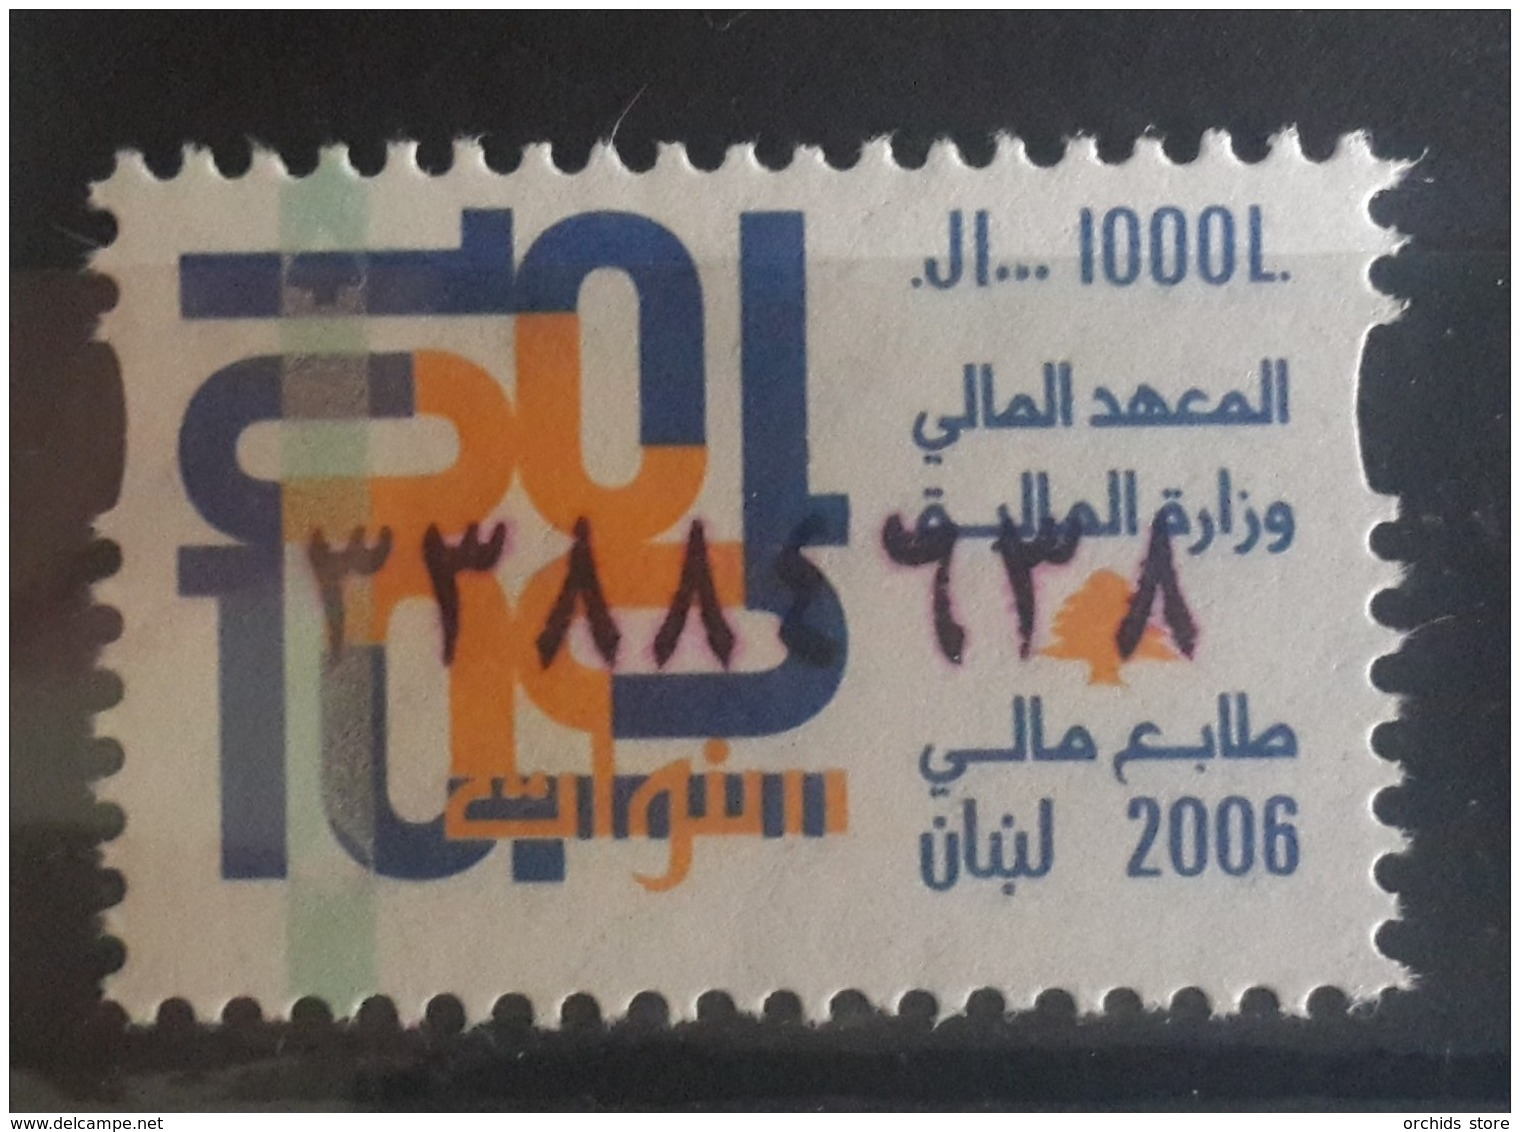 Lebanon 2006 Fiscal Revenue Stamp 1000 L - MNH - 10th Anniv Of Finance Institite - Minstry Of Finance - Lebanon